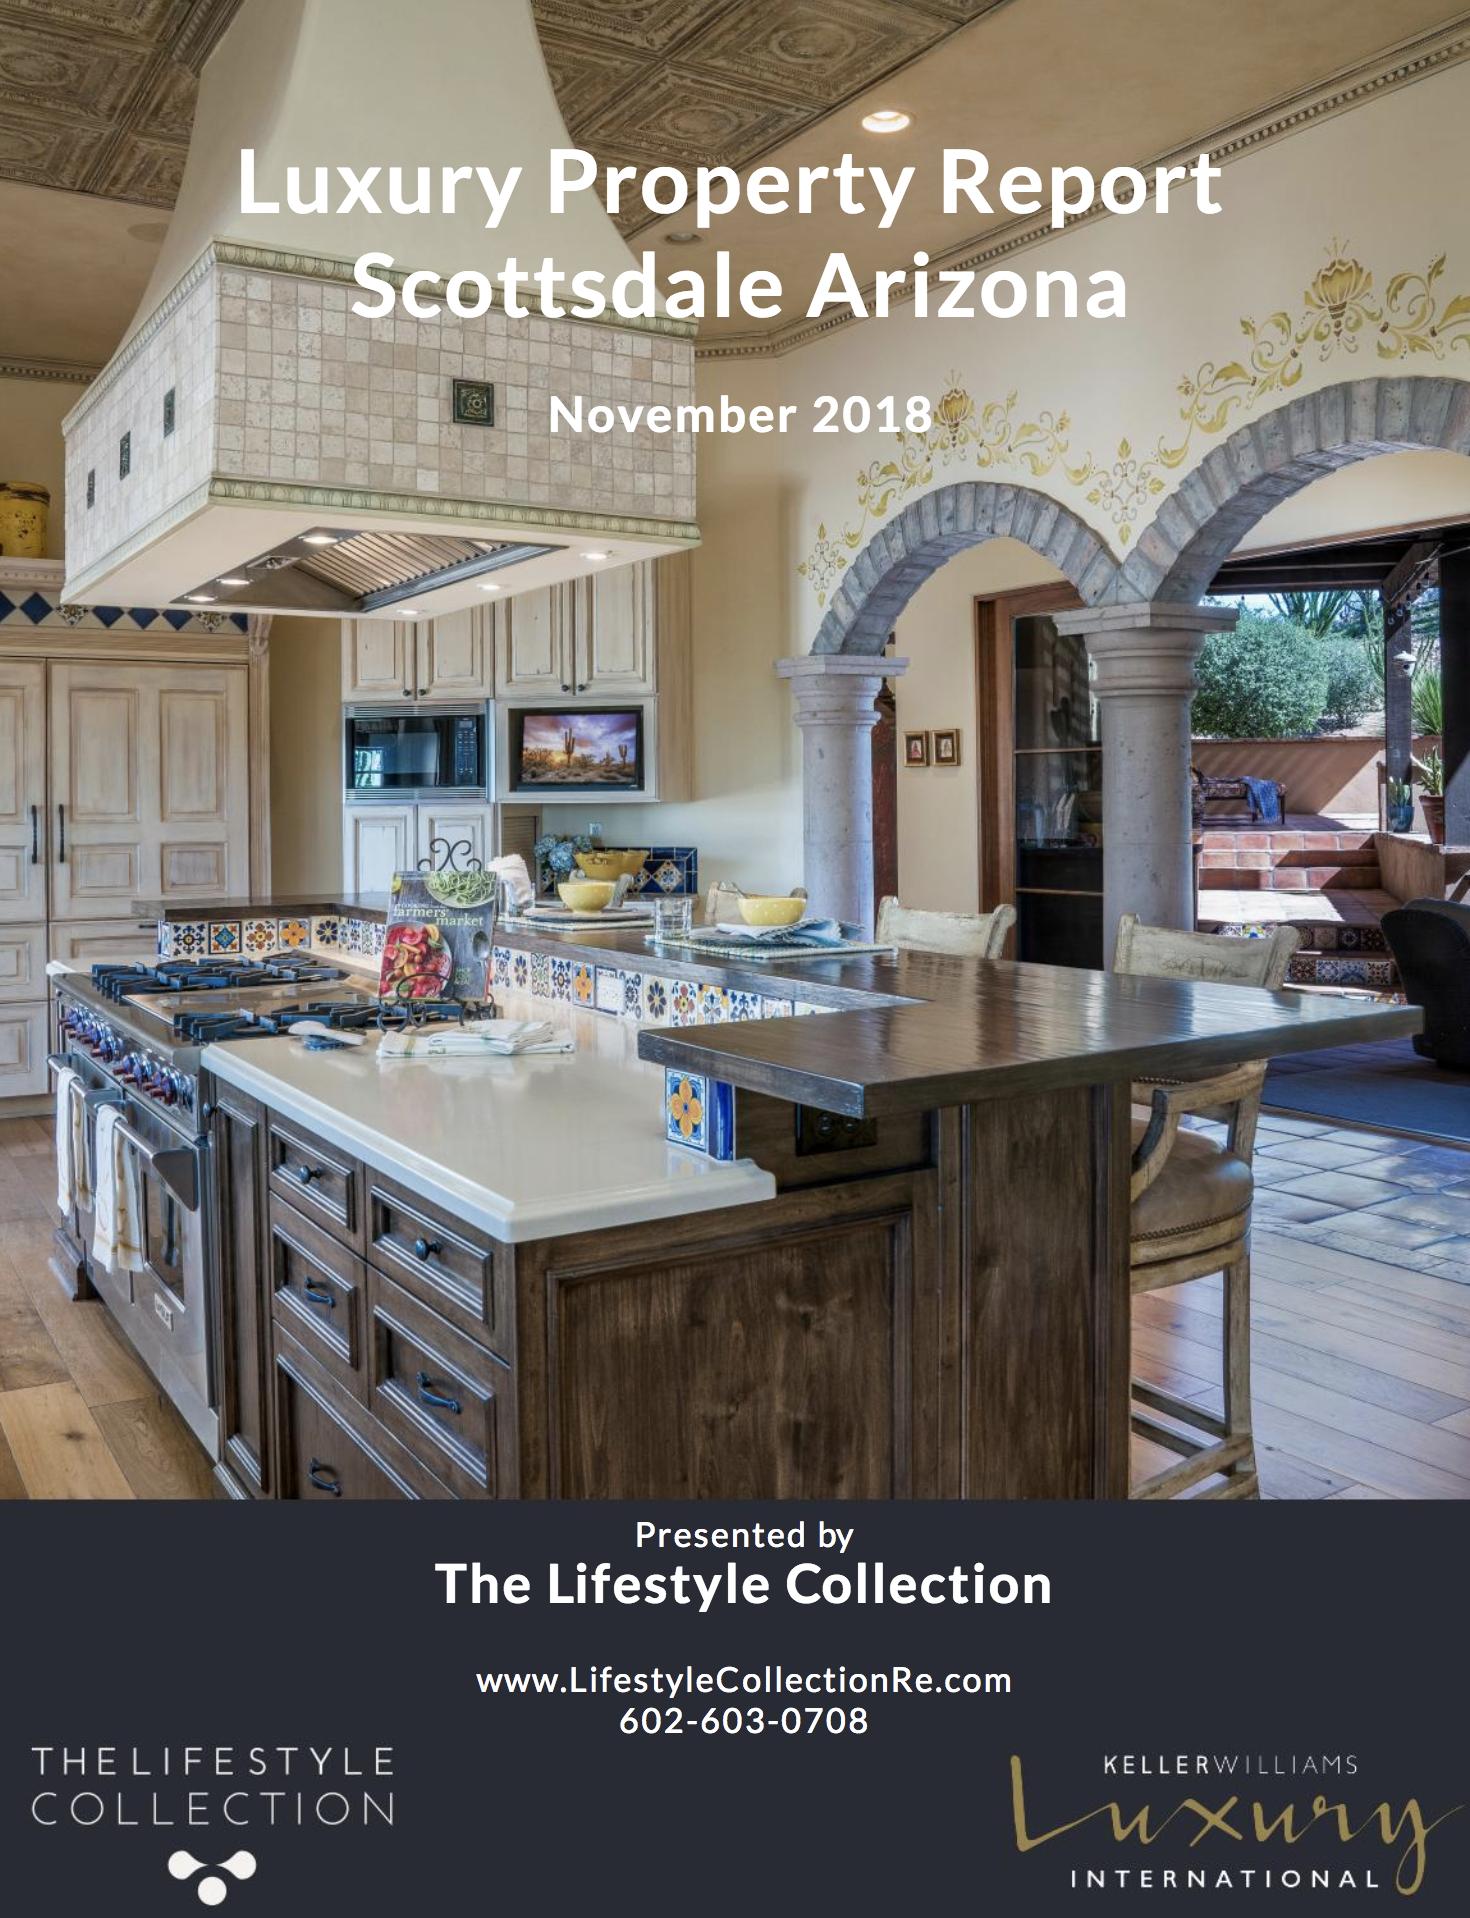 Scottsdale Luxury Property Report for November 2018